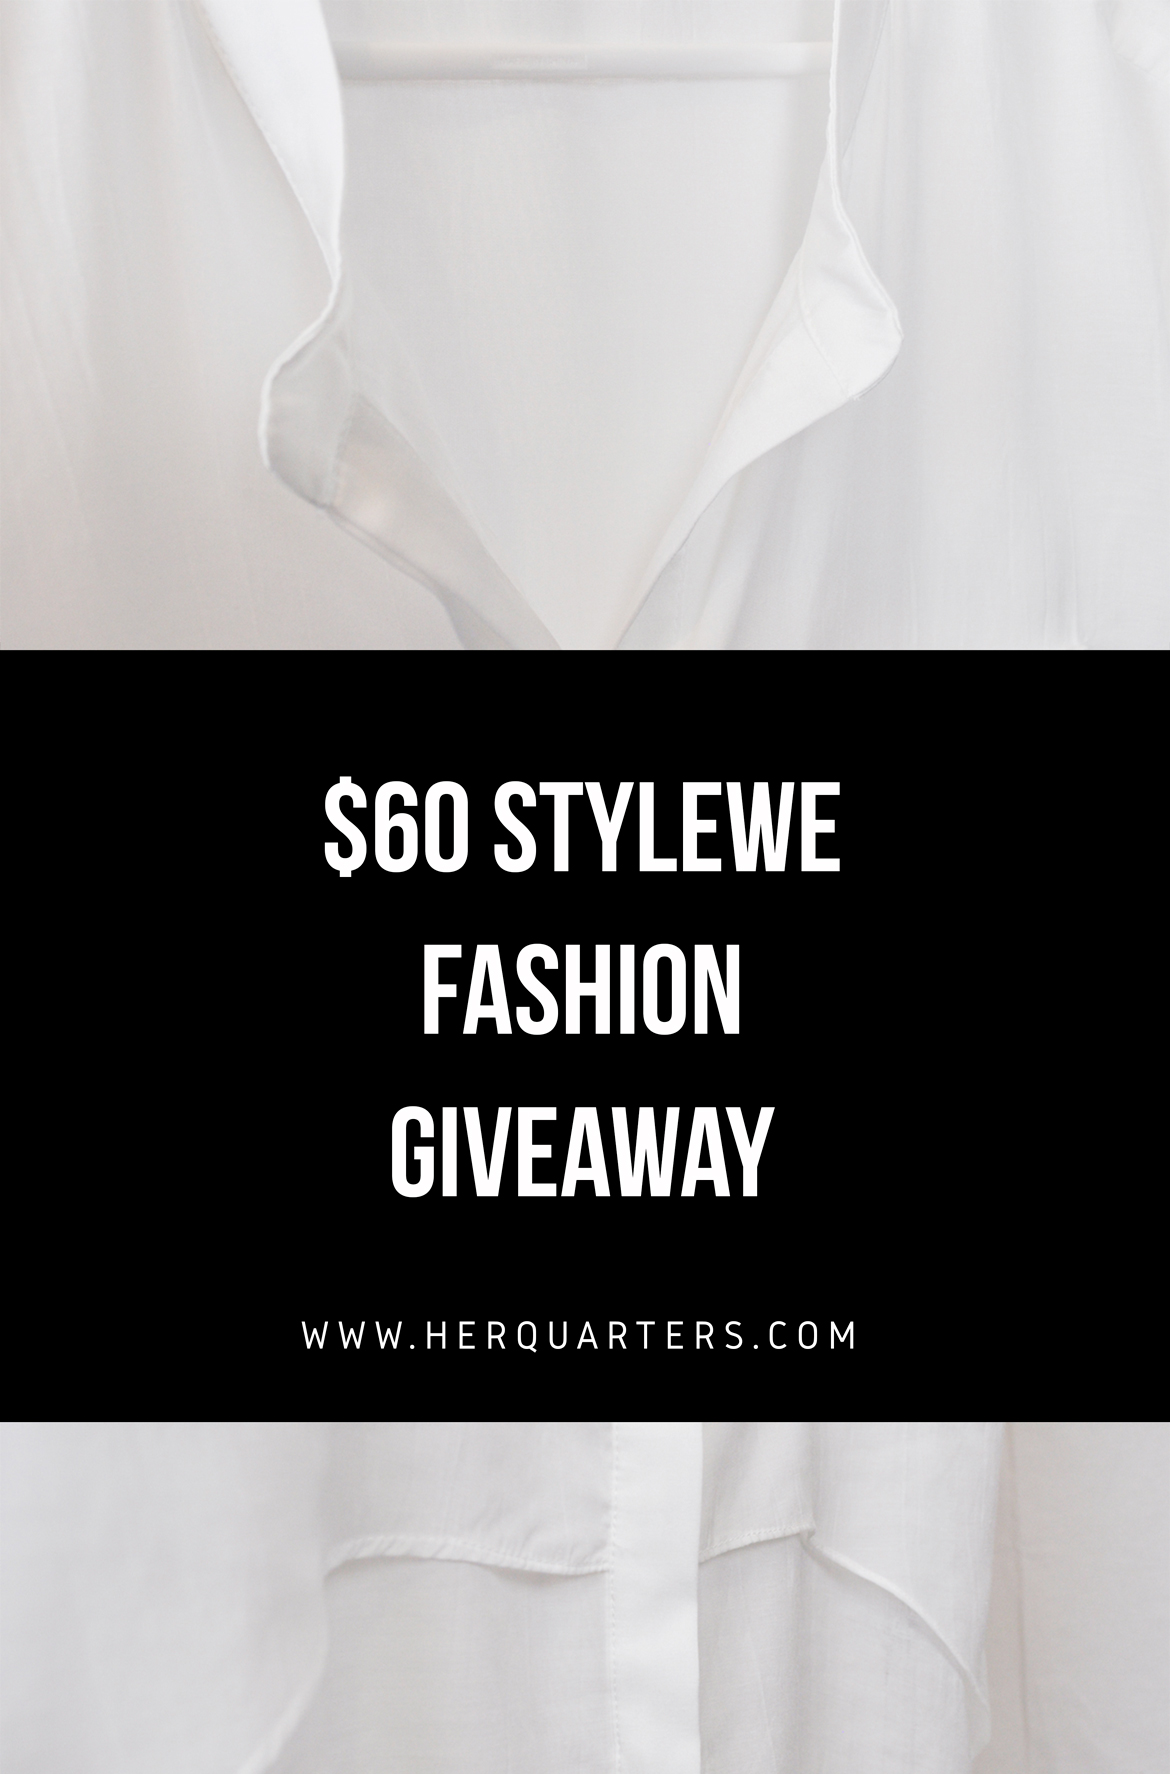 Stylewe Fashion Giveaway